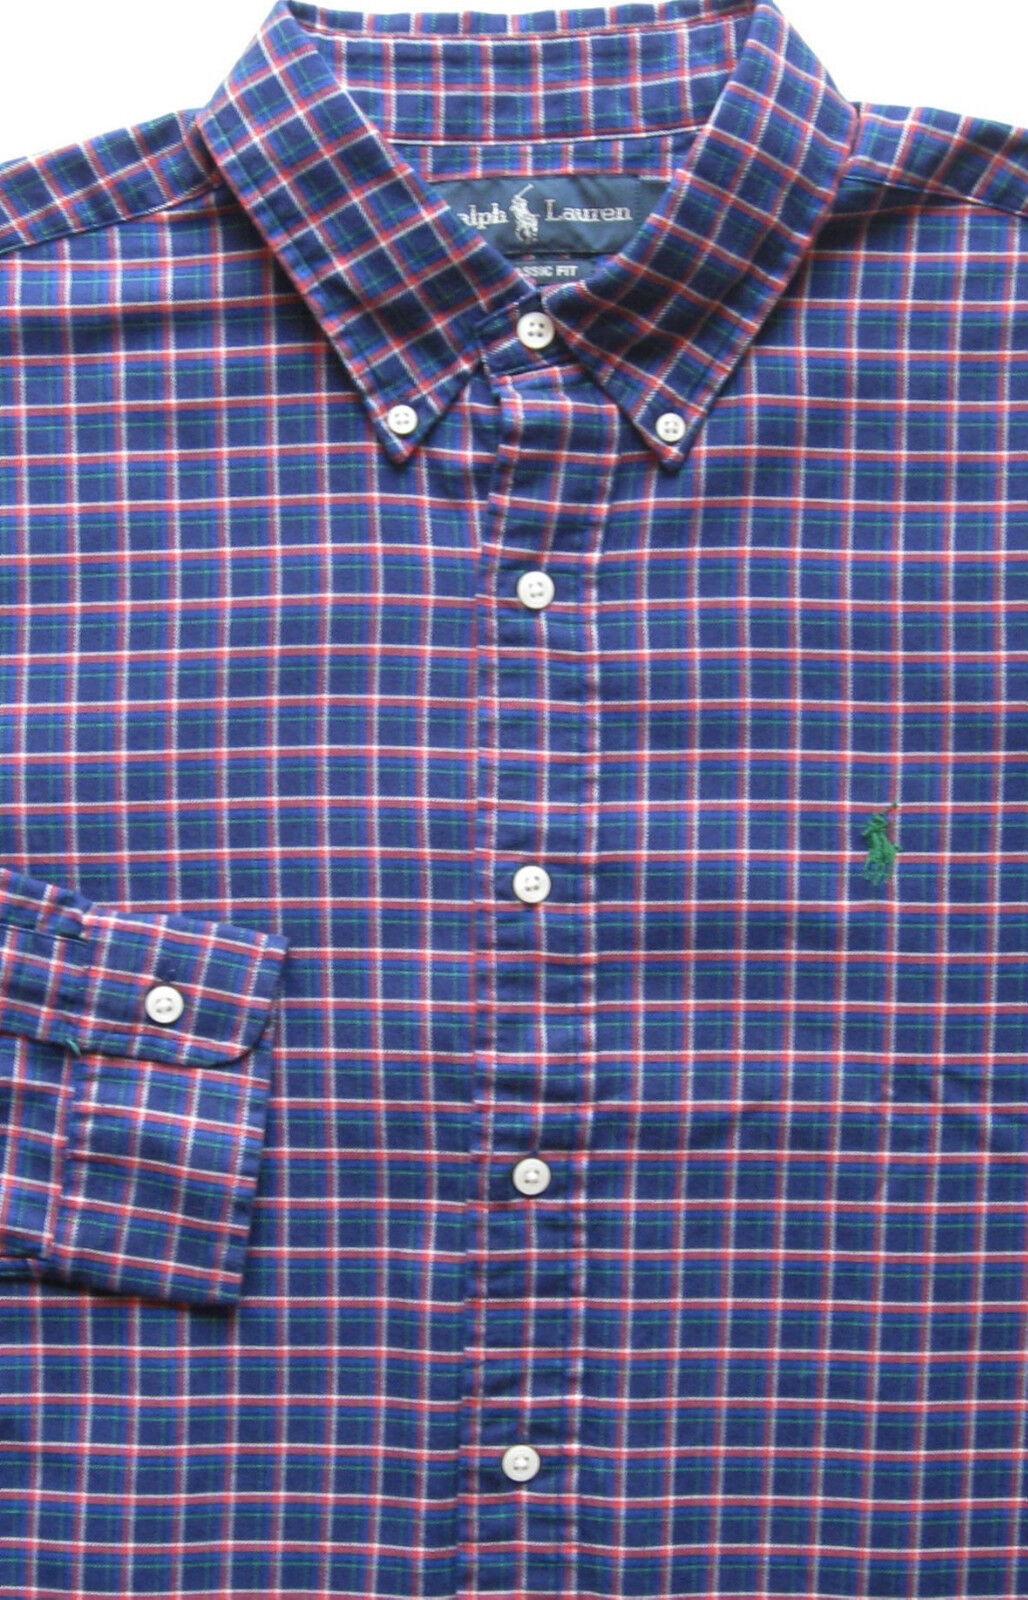 New  Polo Ralph Lauren Long Sleeve bluee Plaid Cotton Shirt   Large